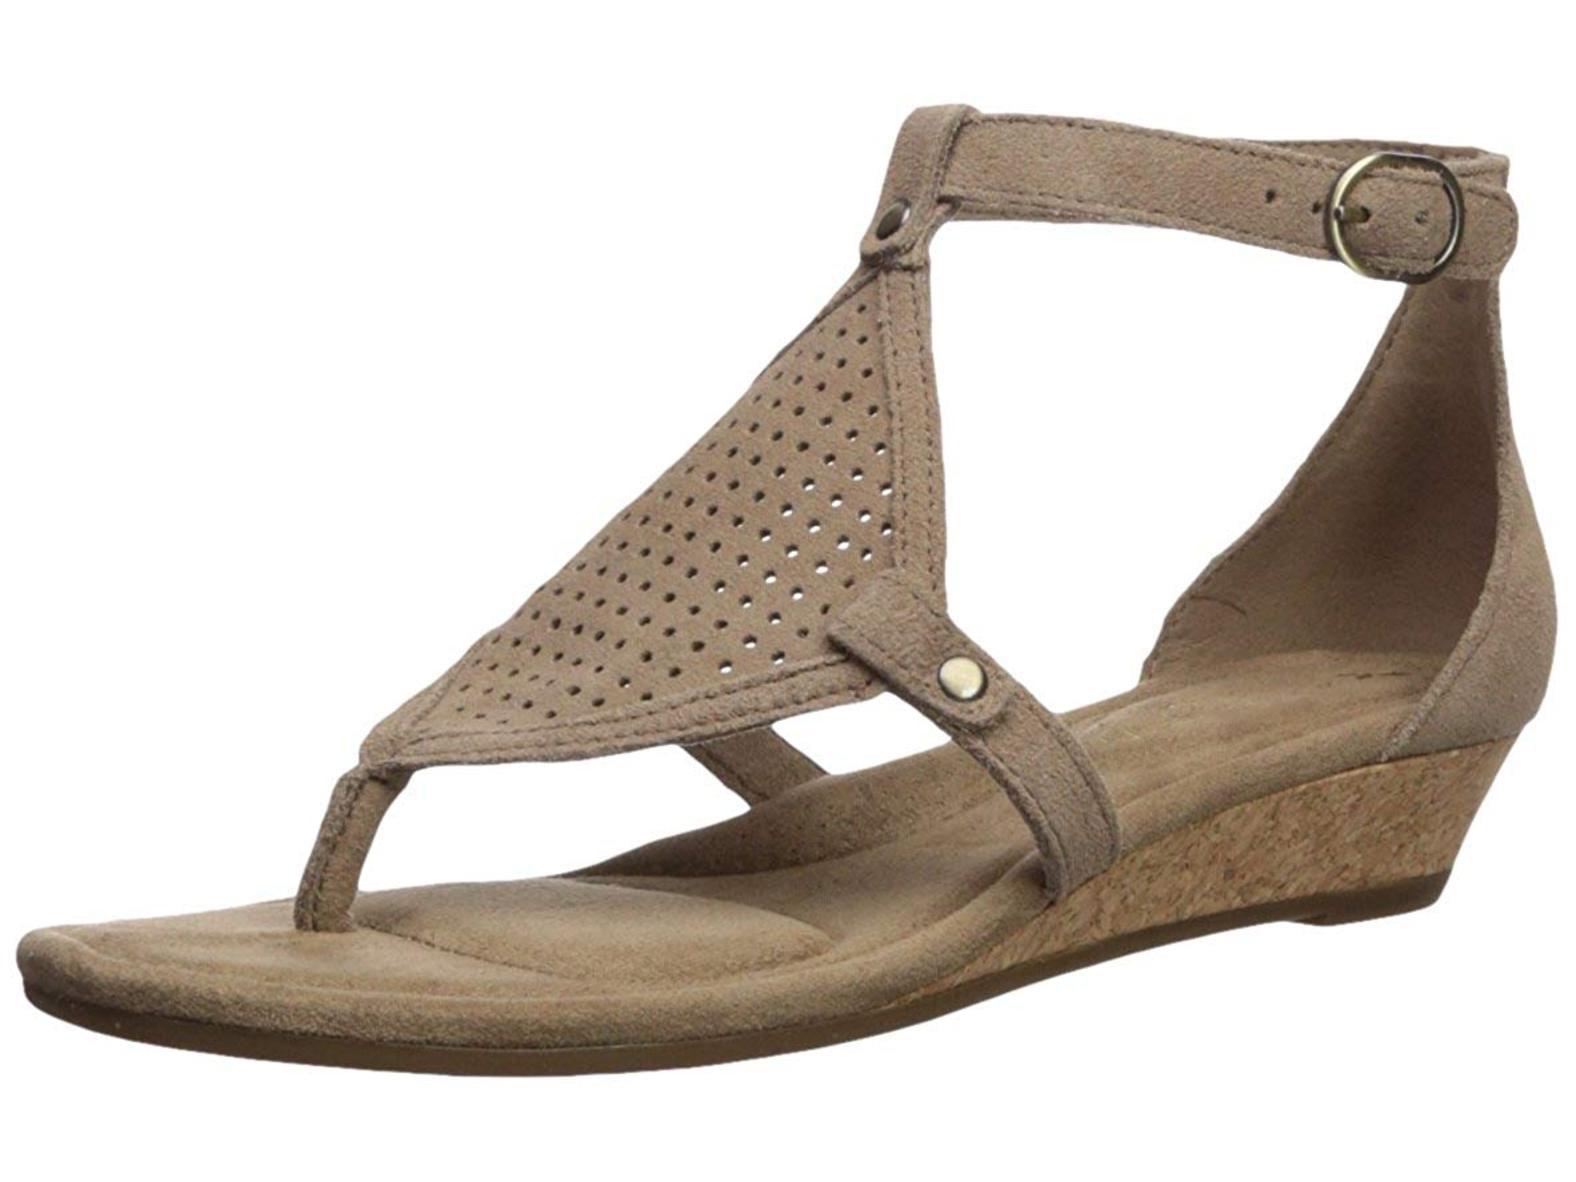 Koolaburra By Ugg Women's W Briona Wedge Sandal by Koolaburra by UGG